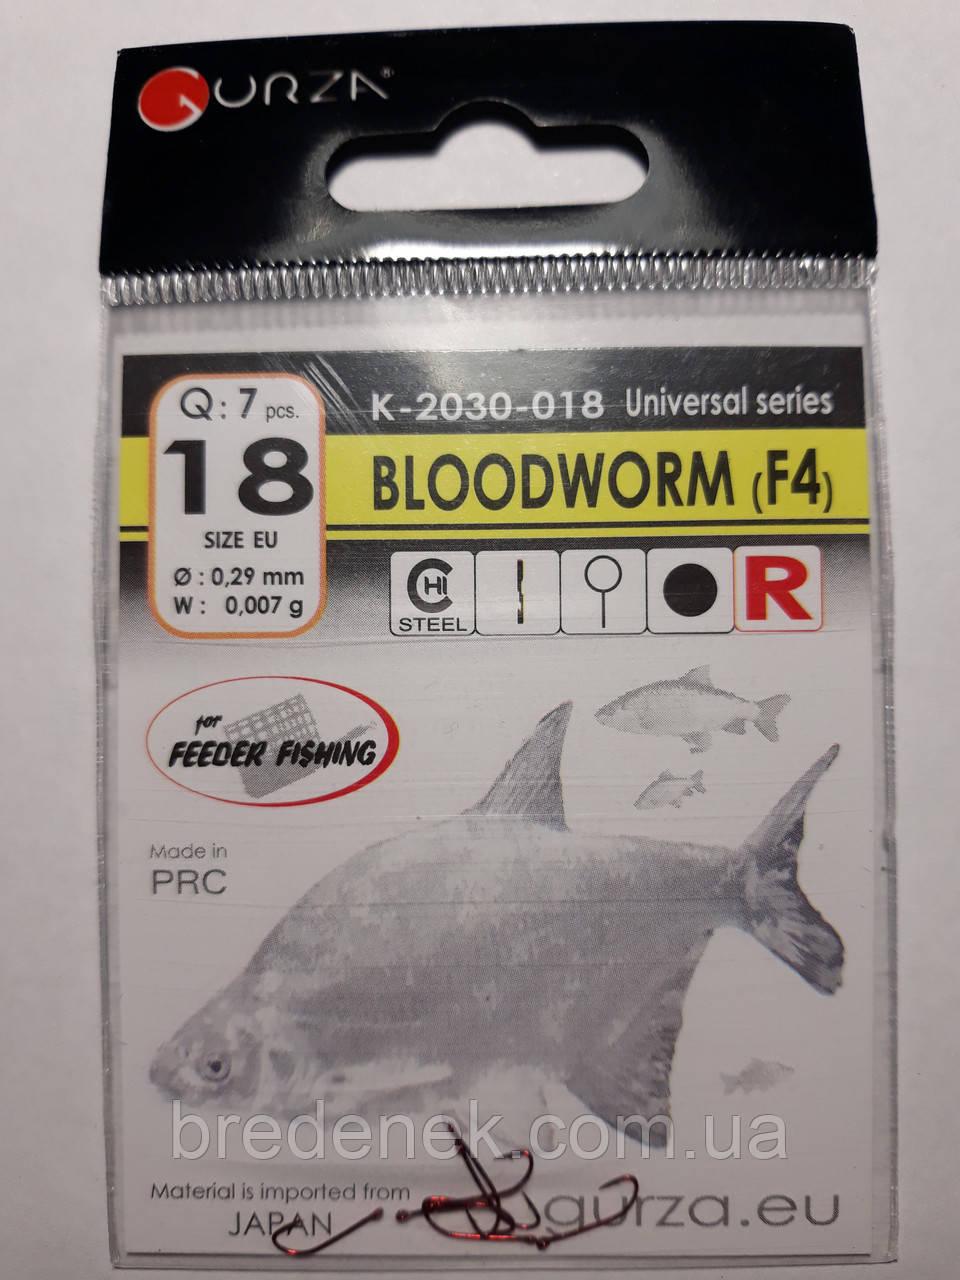 Крючки Gurza bloodworm red № 18